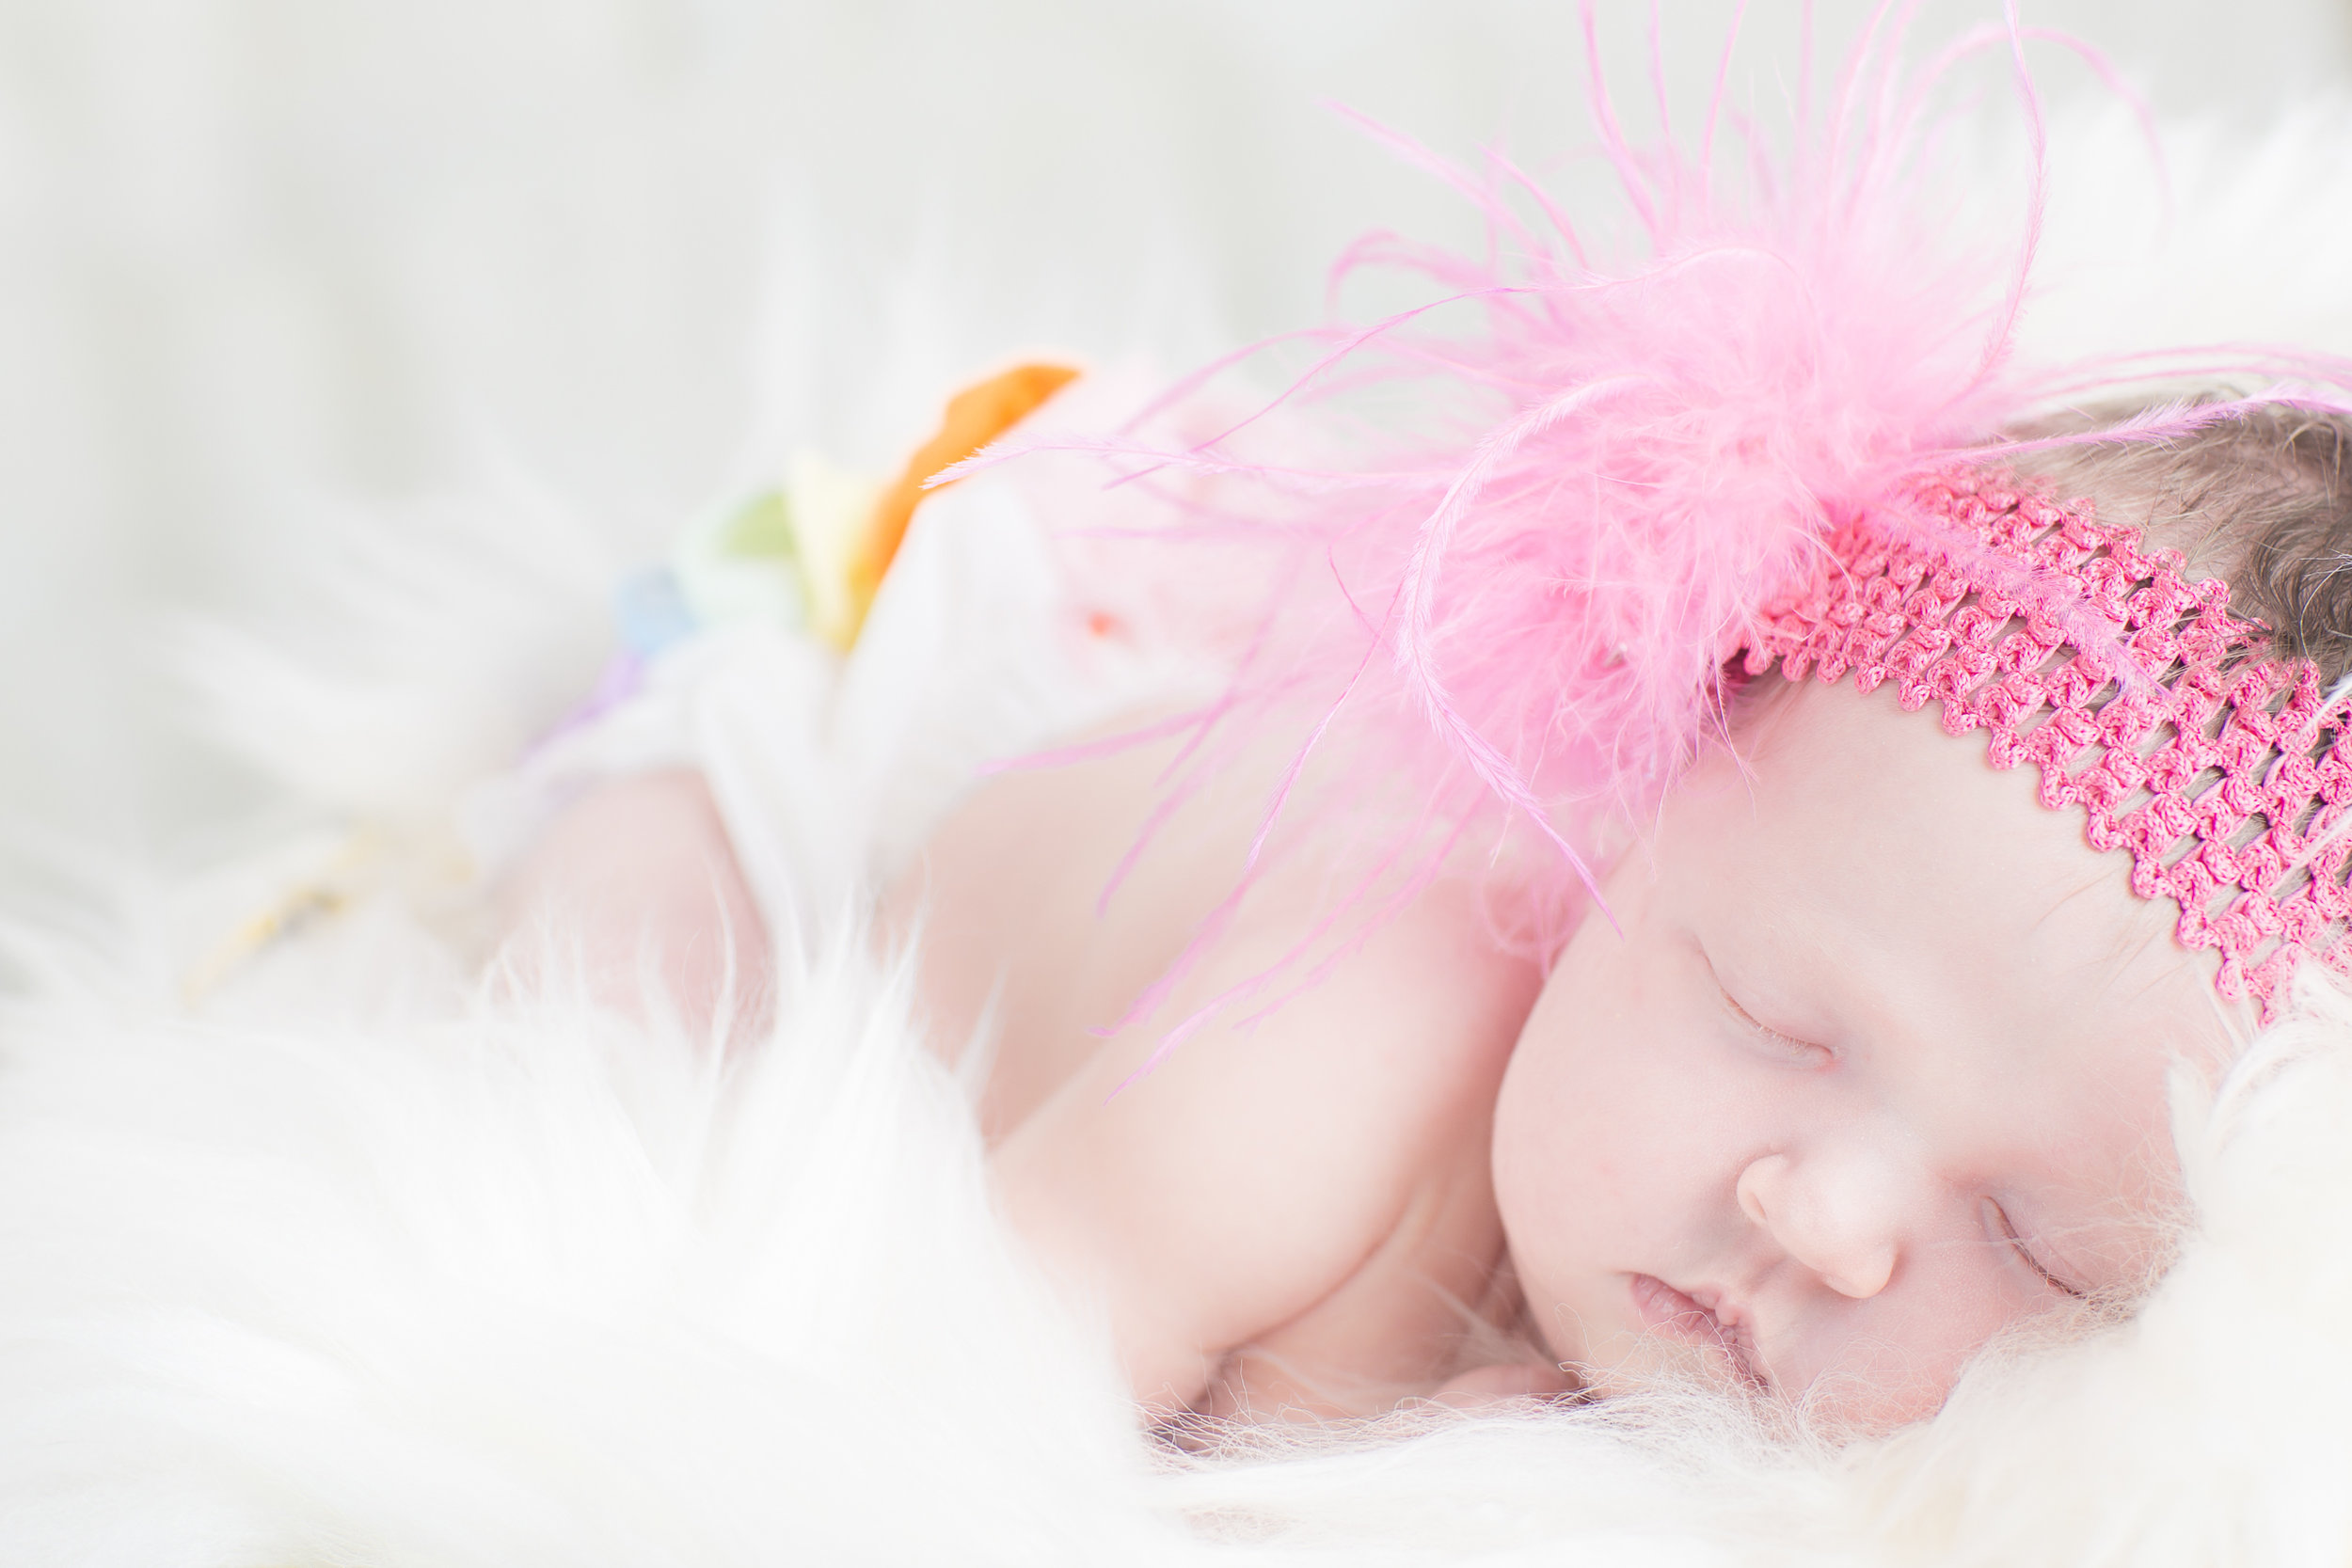 07 newborn girl rainbow pink feather headband fur rug basket studio photography session 2.jpg